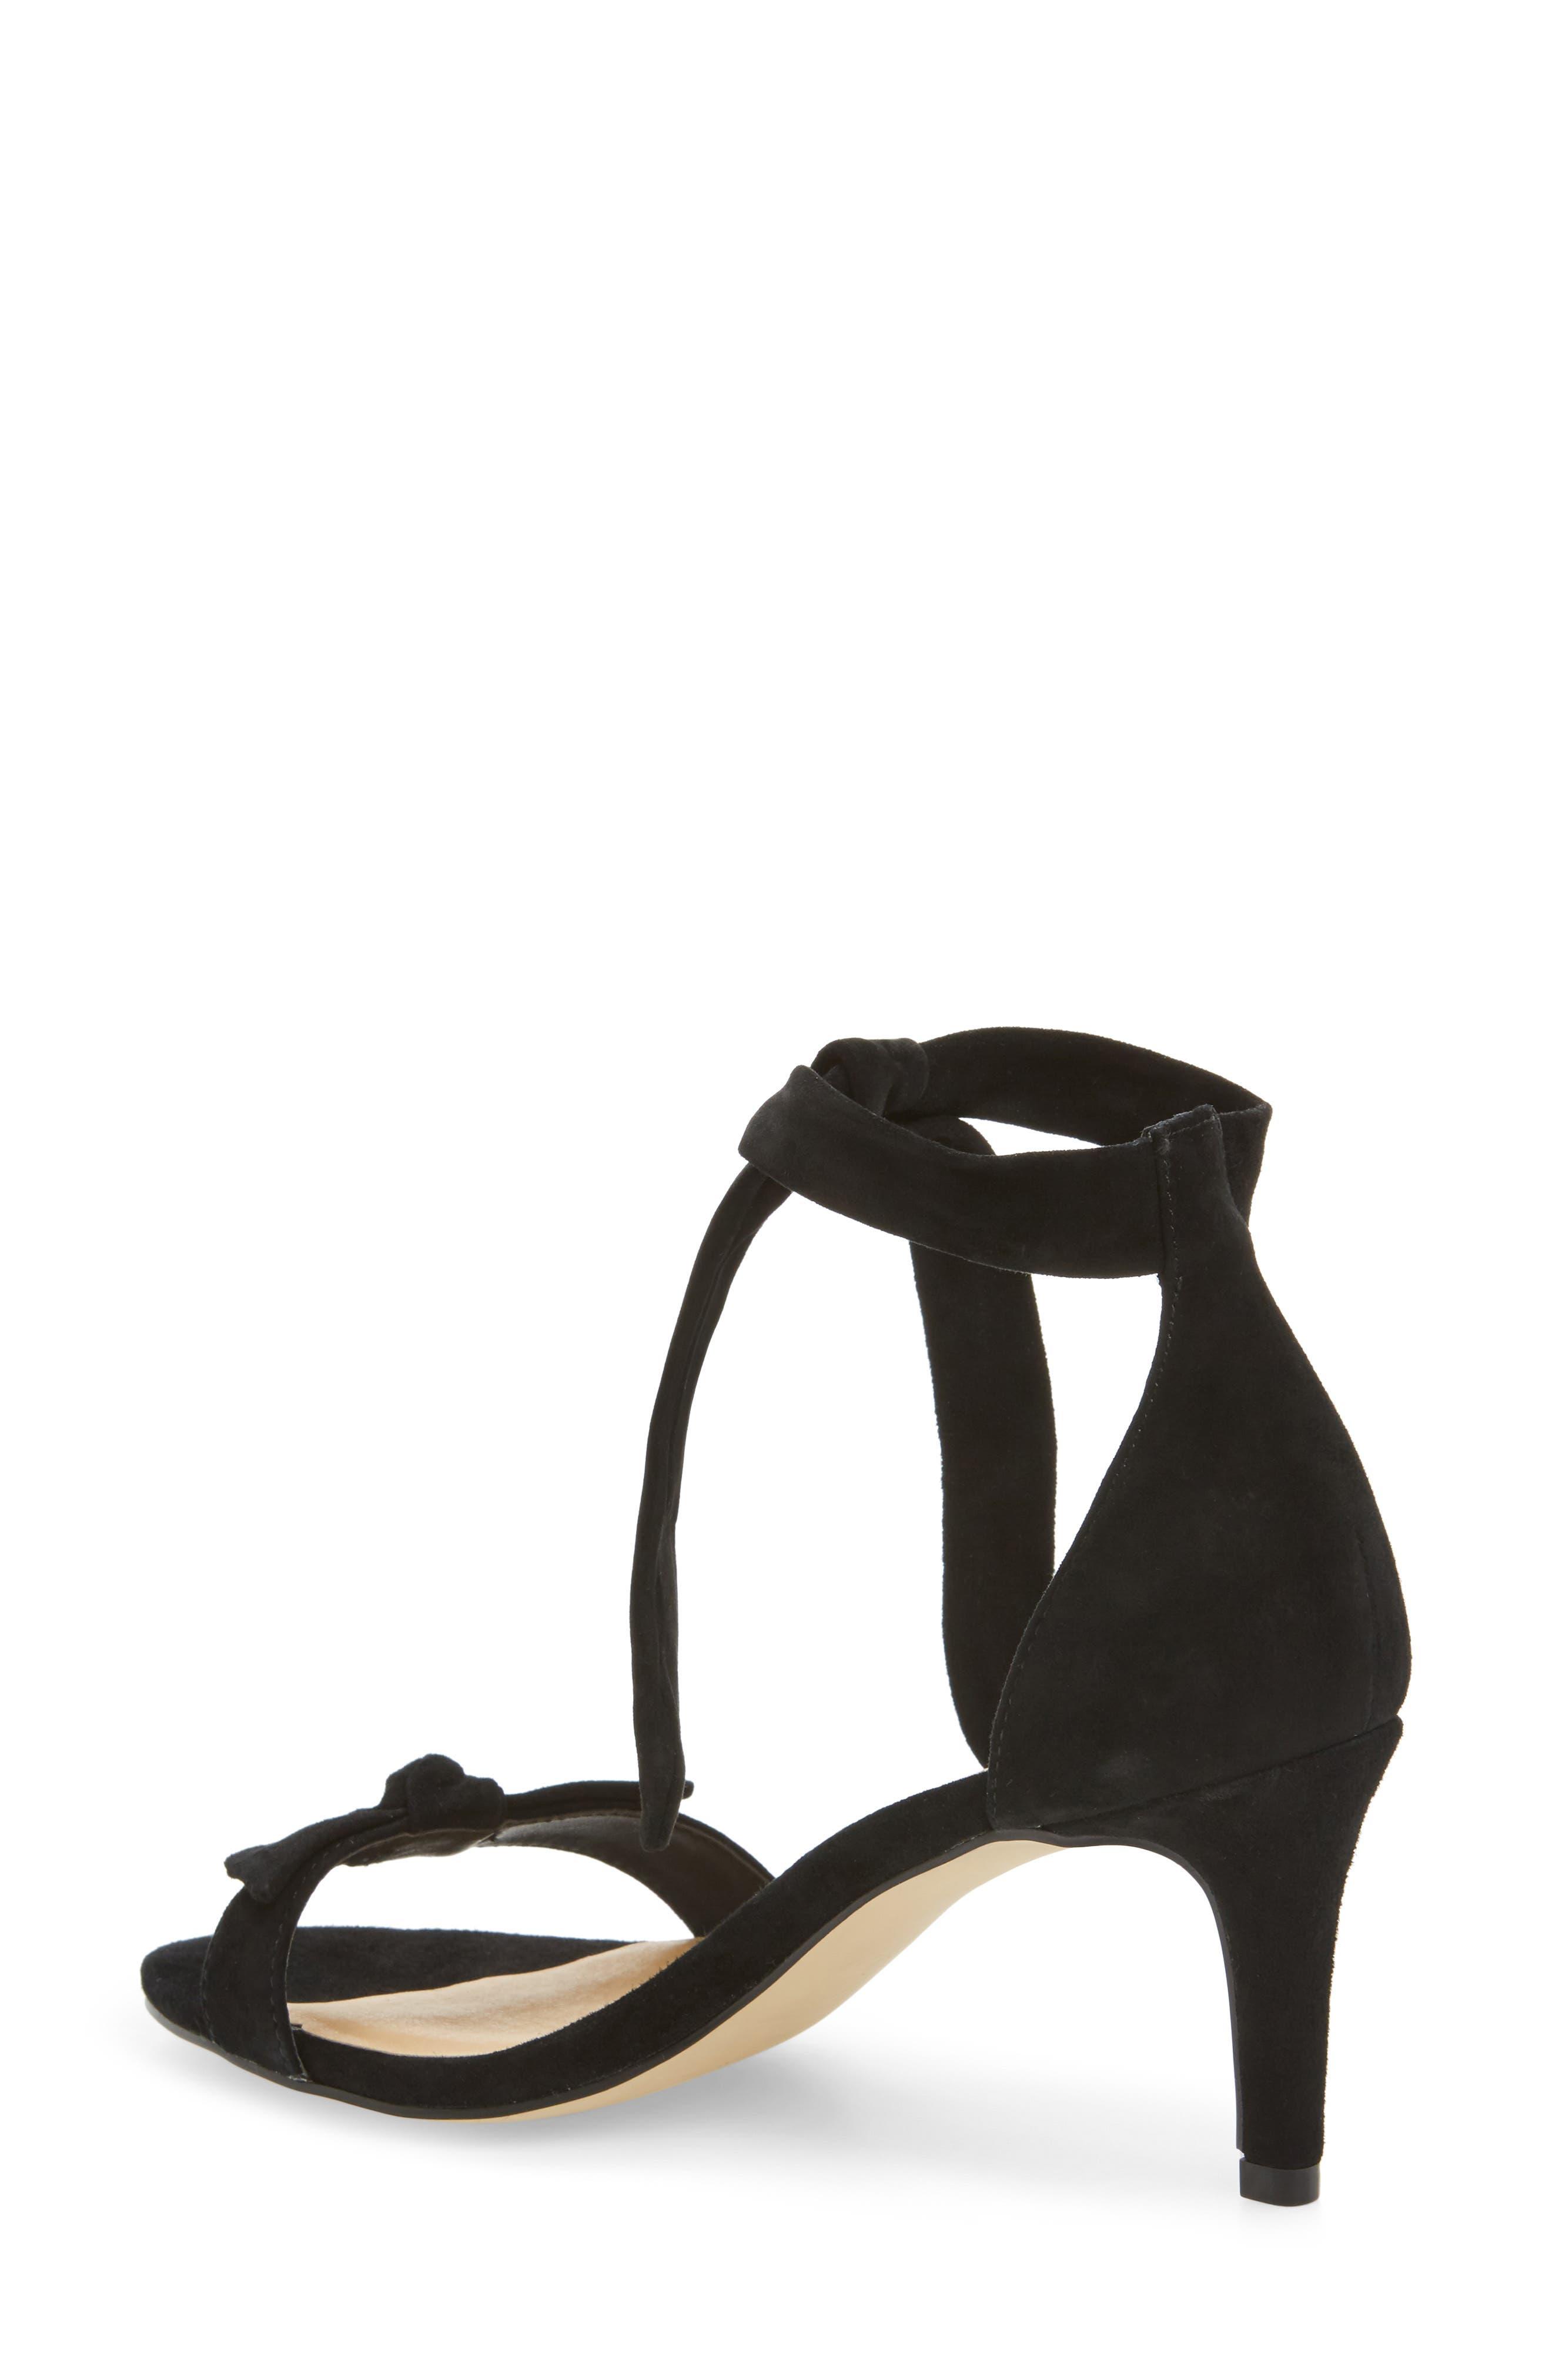 Rhonda Ankle Tie Sandal,                             Alternate thumbnail 2, color,                             001